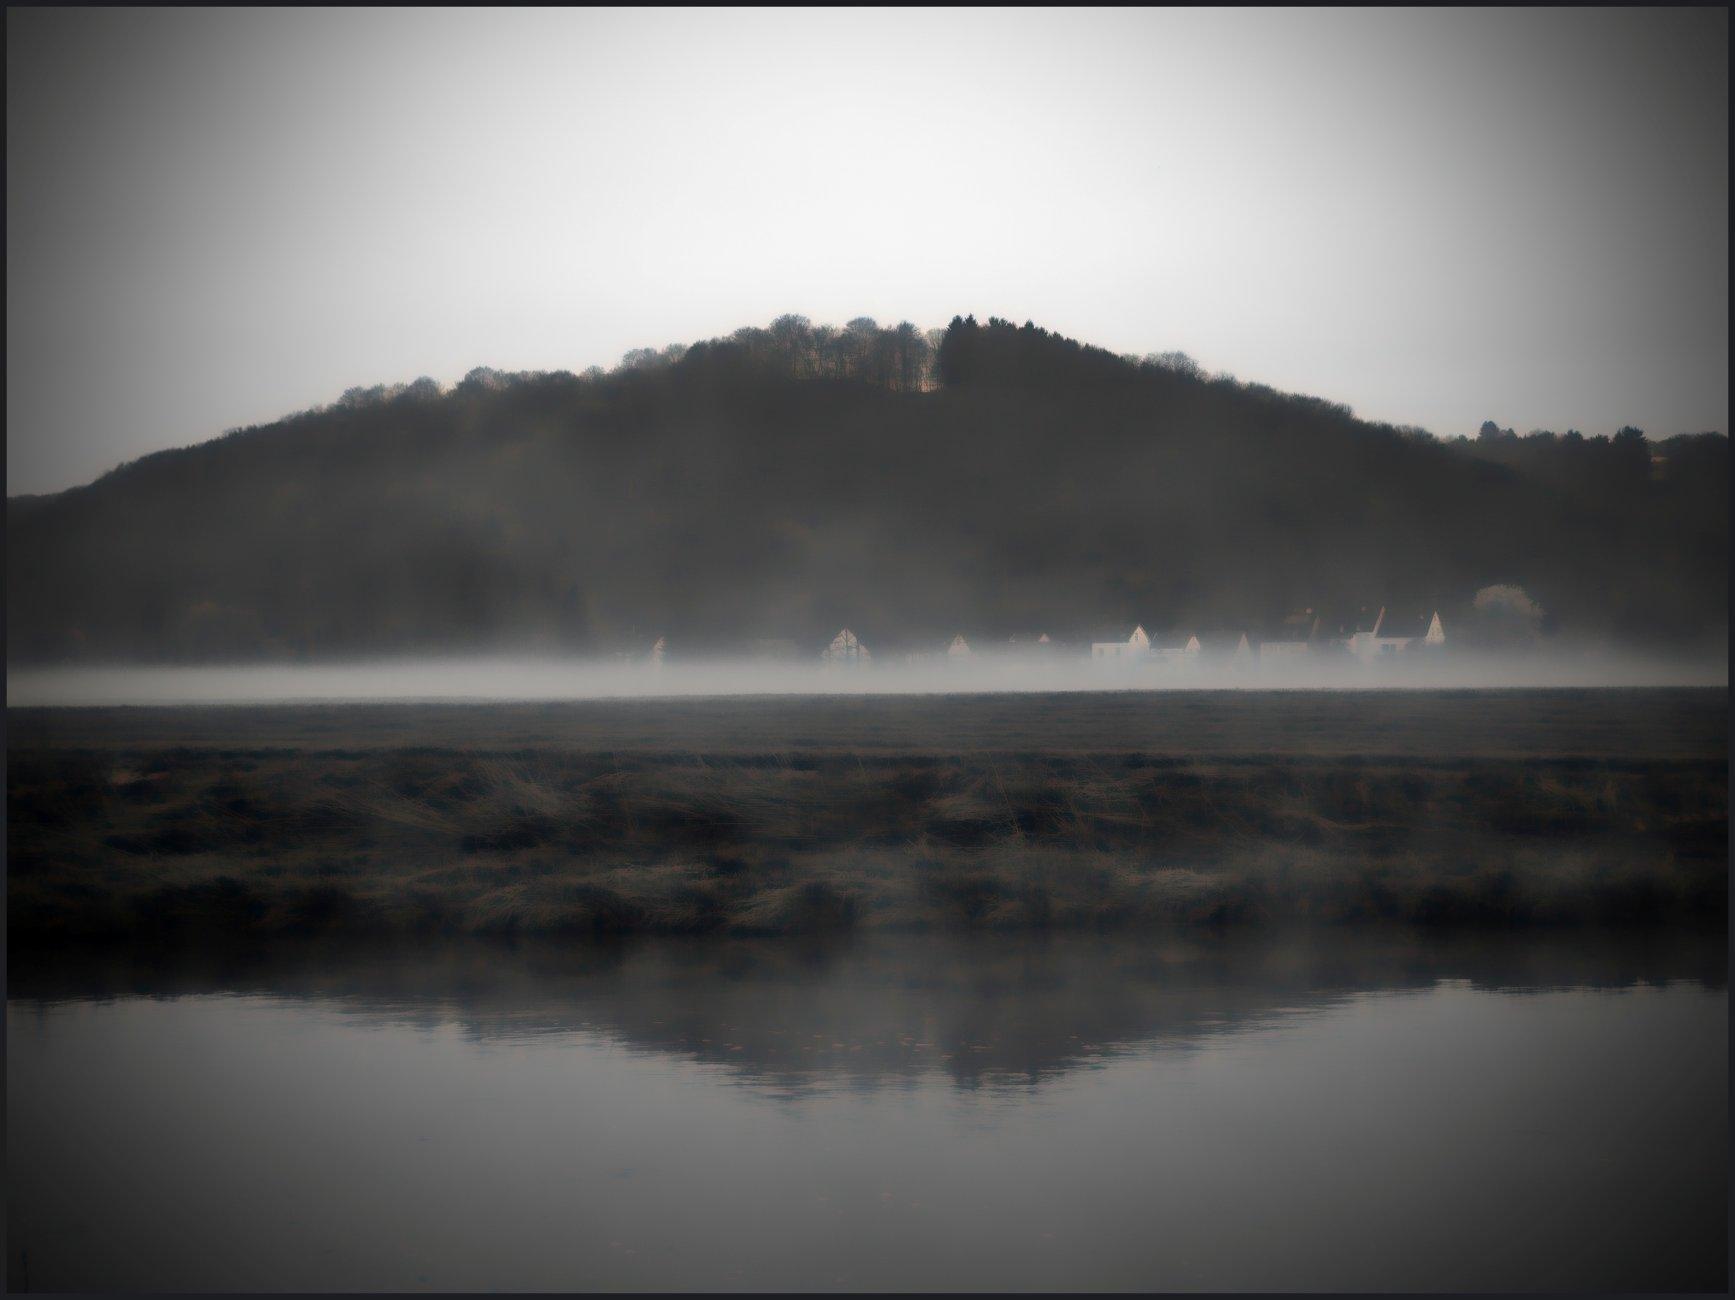 Morning At The River - 2